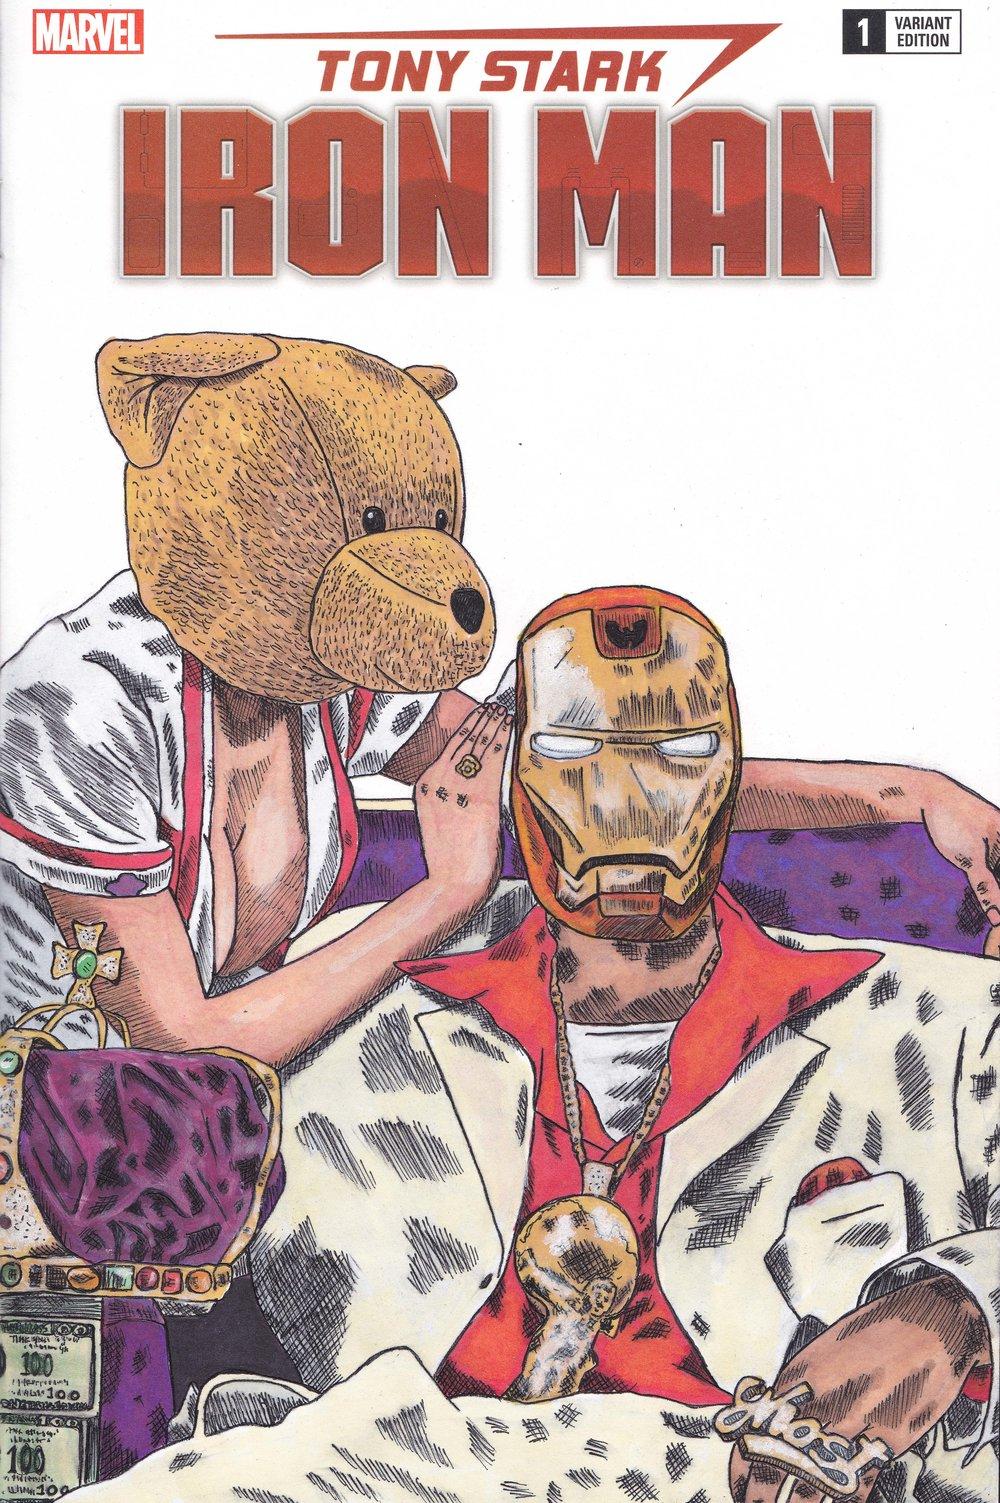 Ironman - Sean 9 Lugo Copyright 2018.jpg